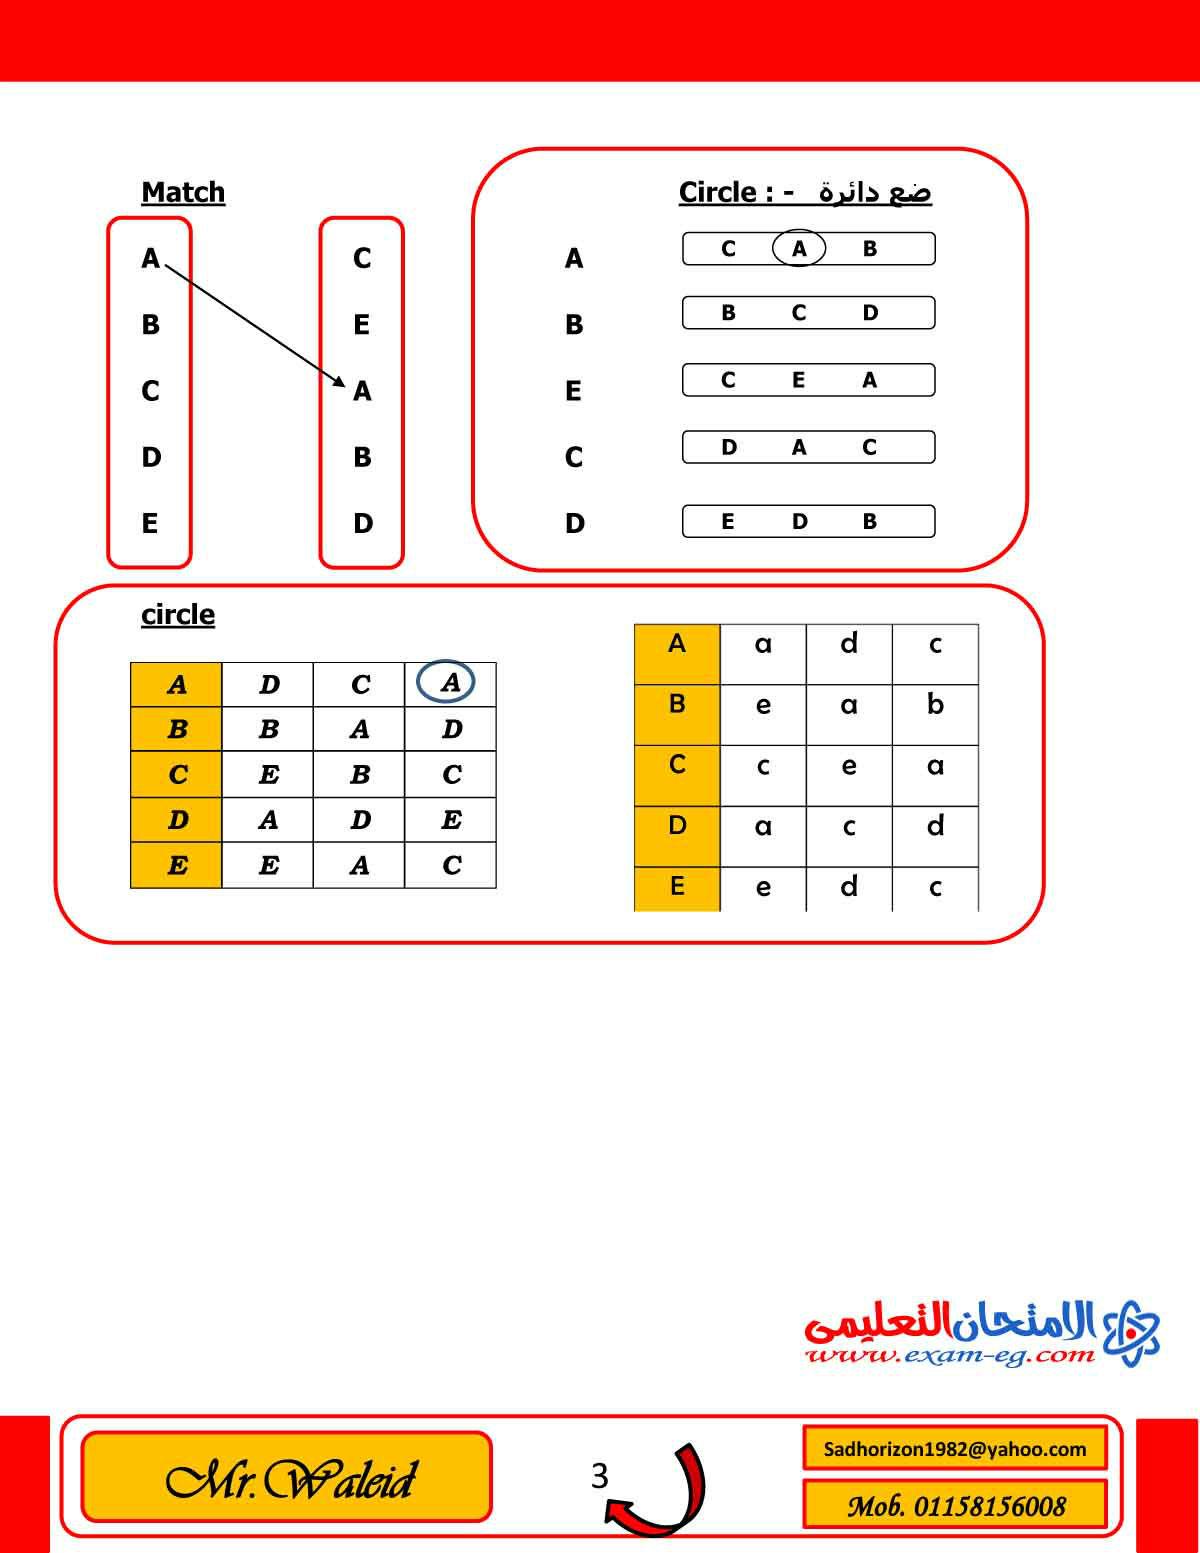 exam-eg.com_1449405243153.jpg